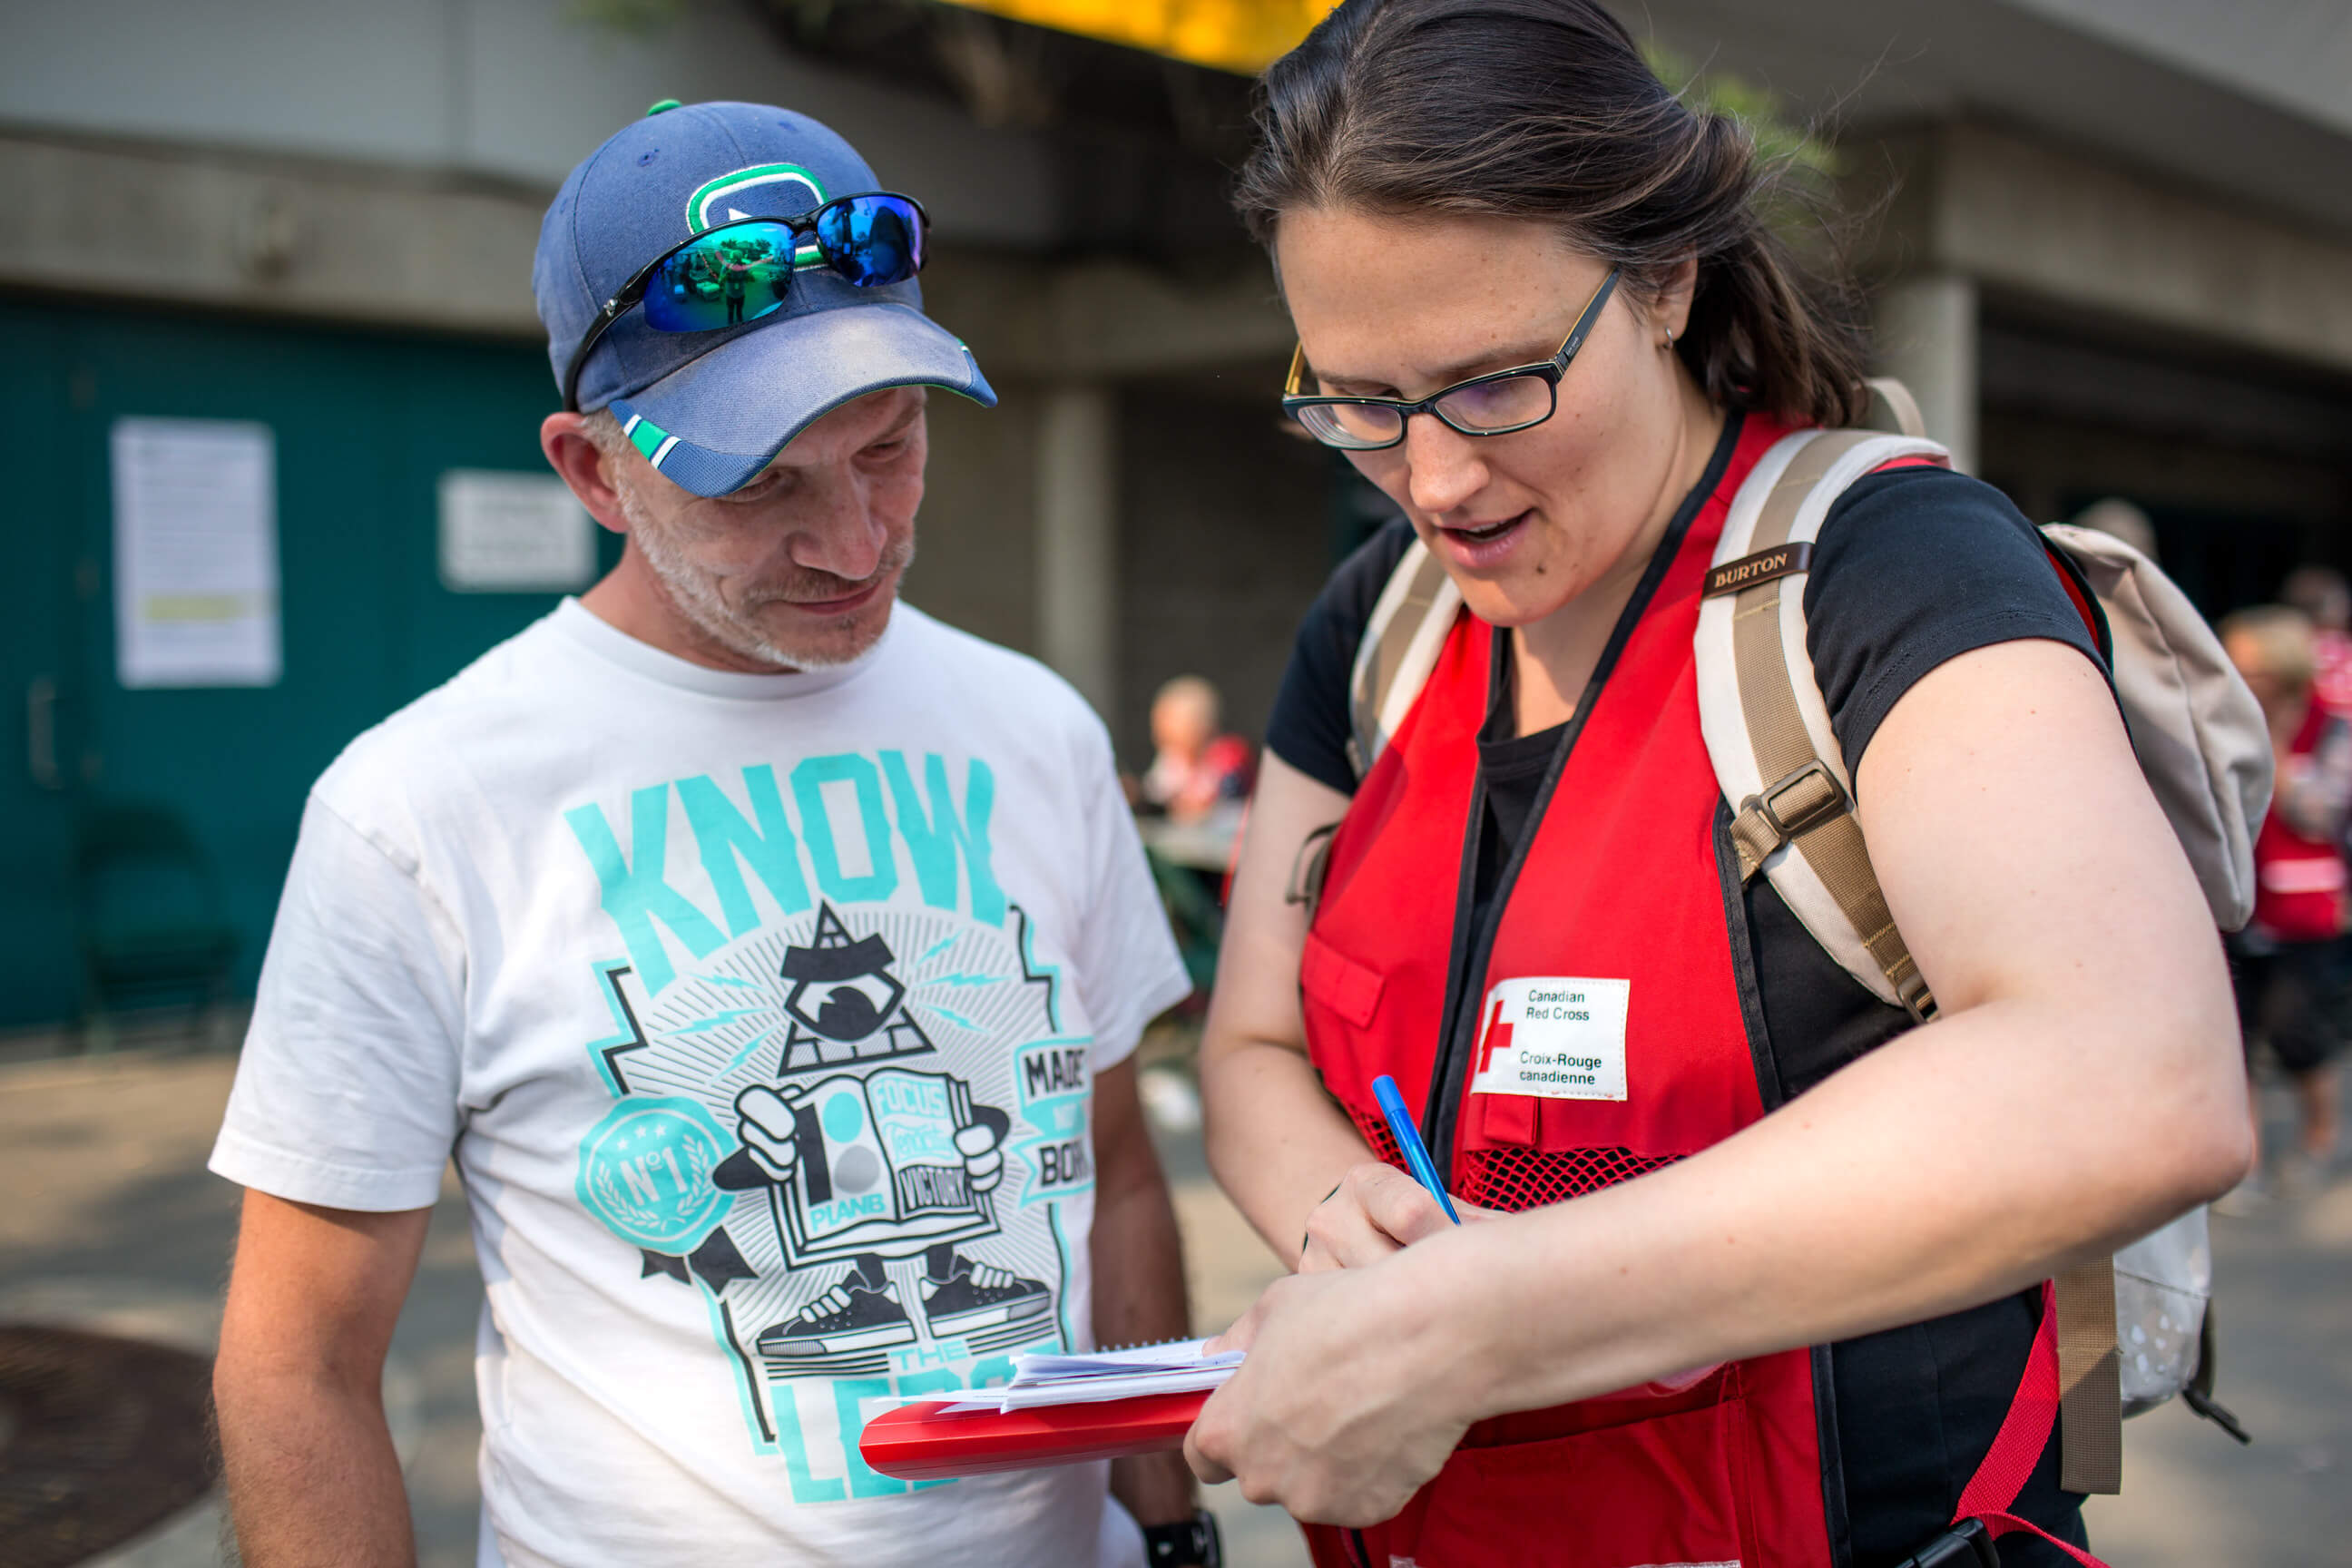 Ready to respond? Volunteer to help Okanagan people in need